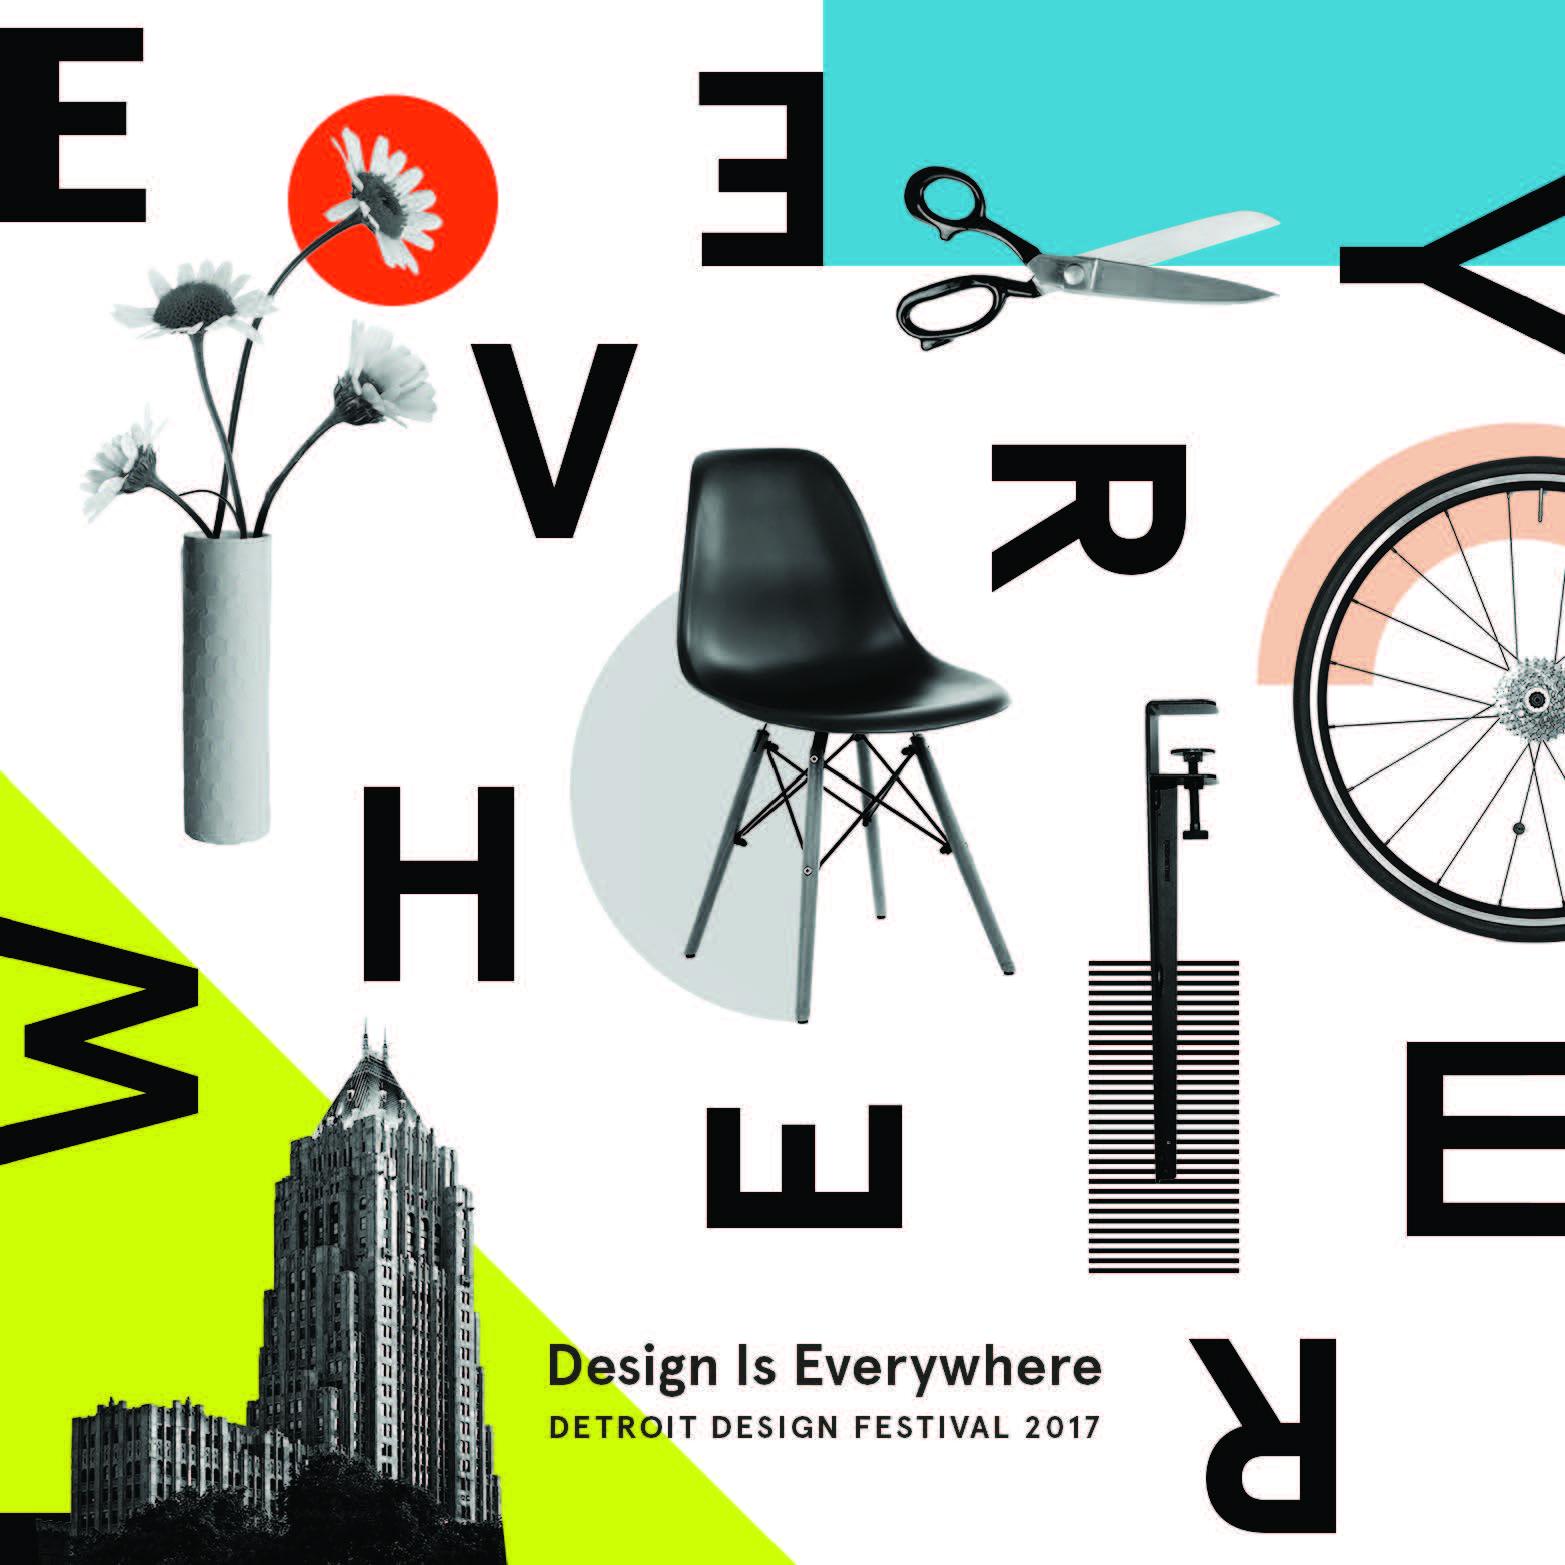 DDF 2017 Design Is Everywhere